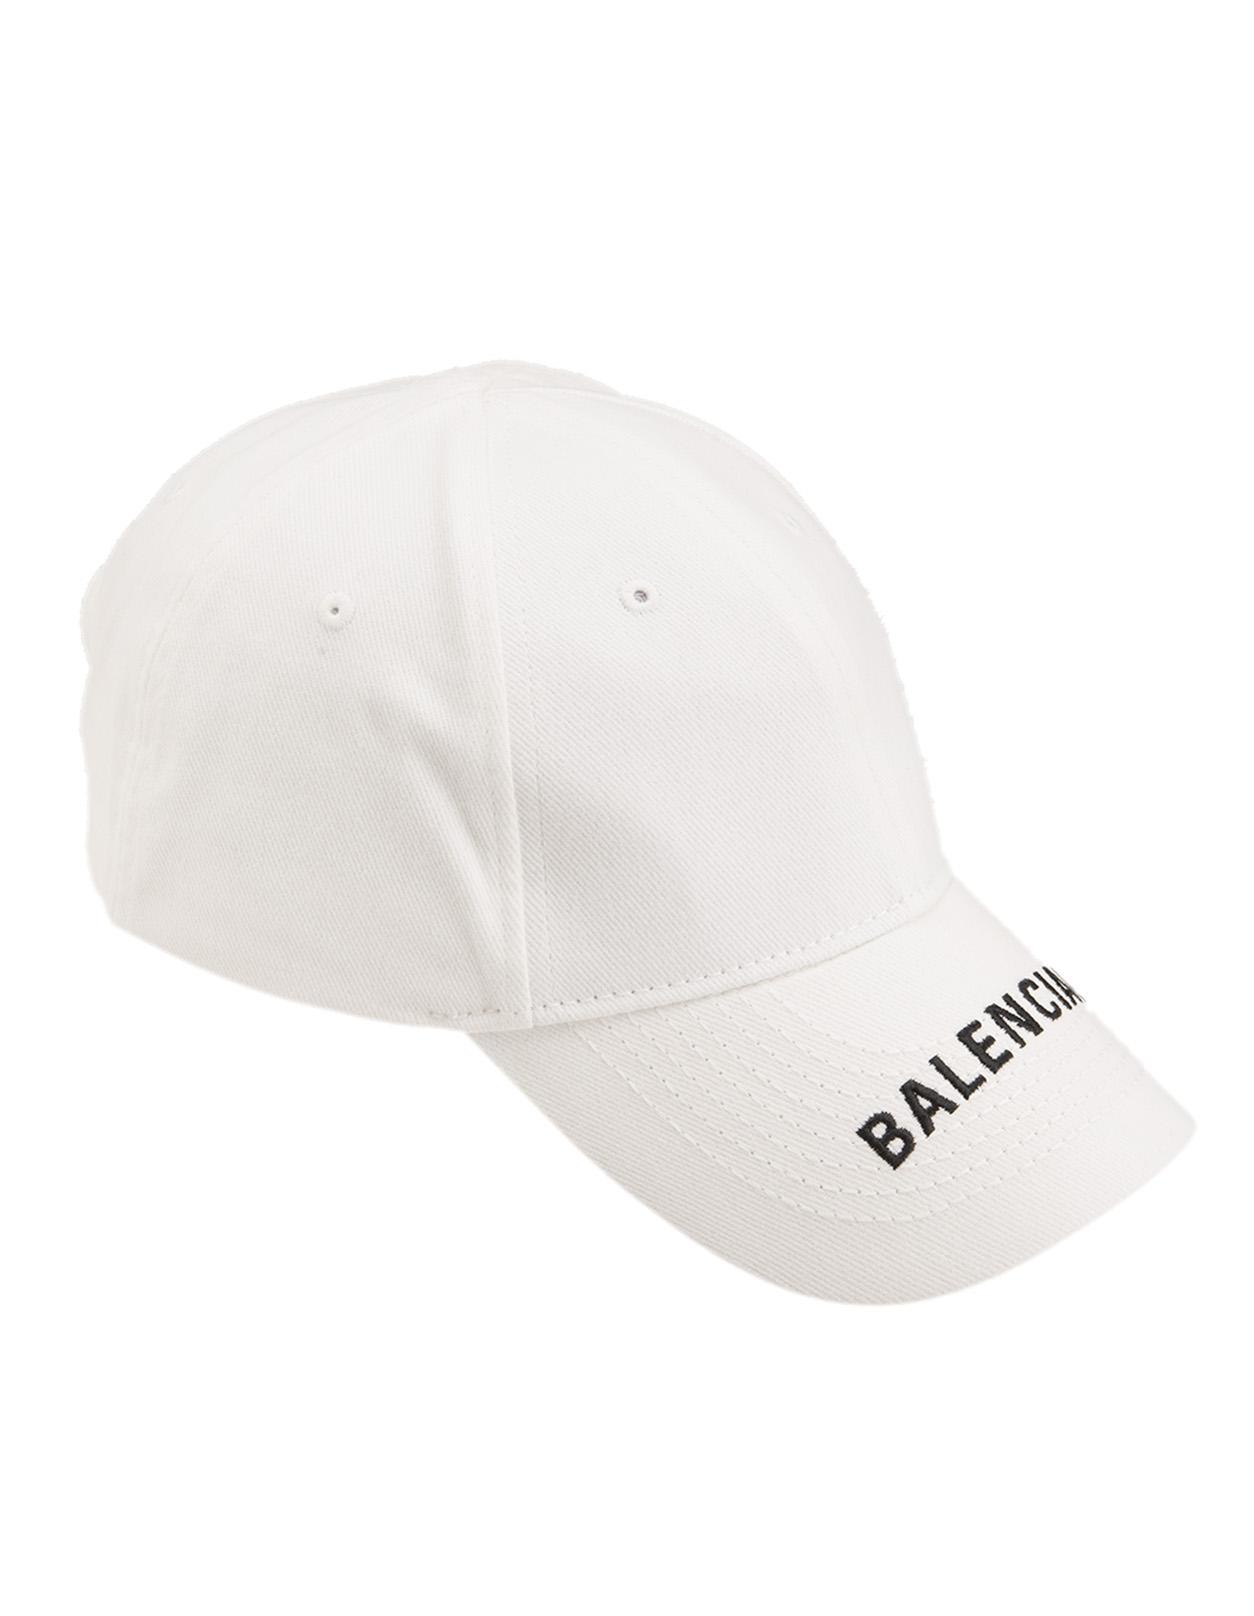 7d6a6cabeefaa Baseball Logo Hat - BALENCIAGA - Russocapri